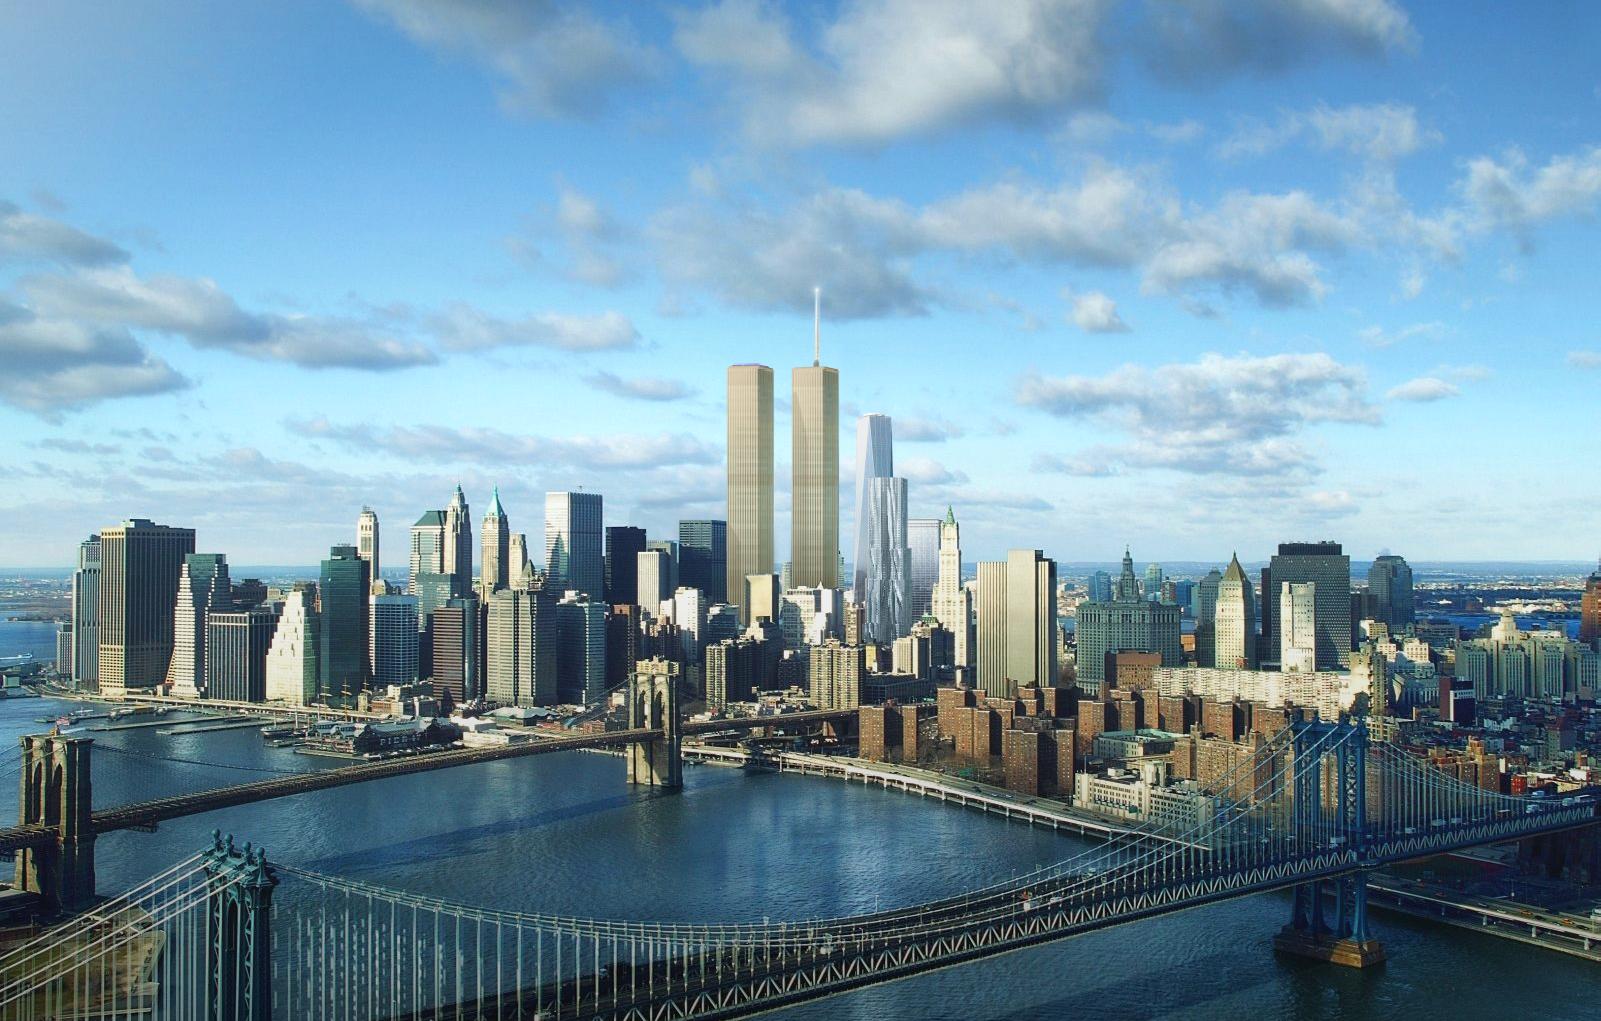 9\/11 Memorial Wallpapers for FREE Download